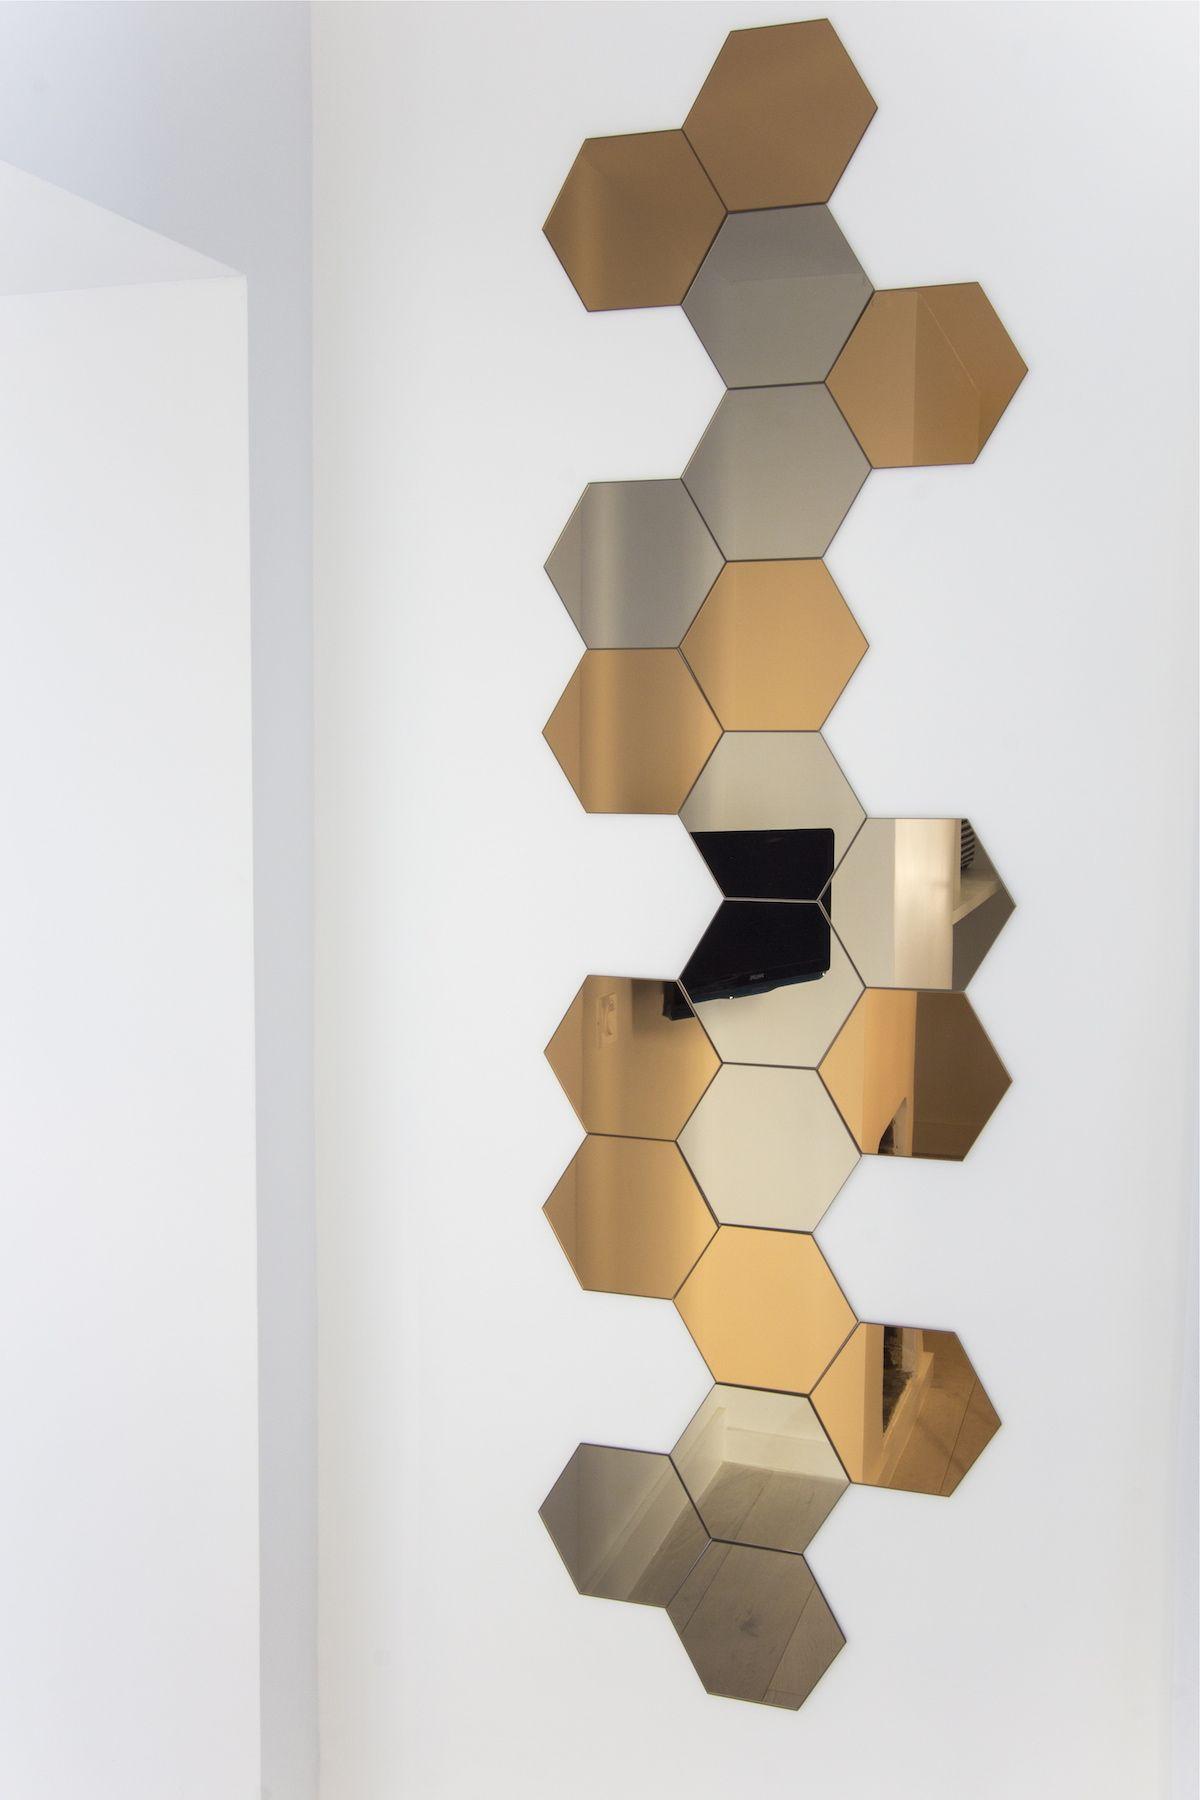 Miroir hexagonal - Miroirs hexagonaux - Hexagonal mirrors ...